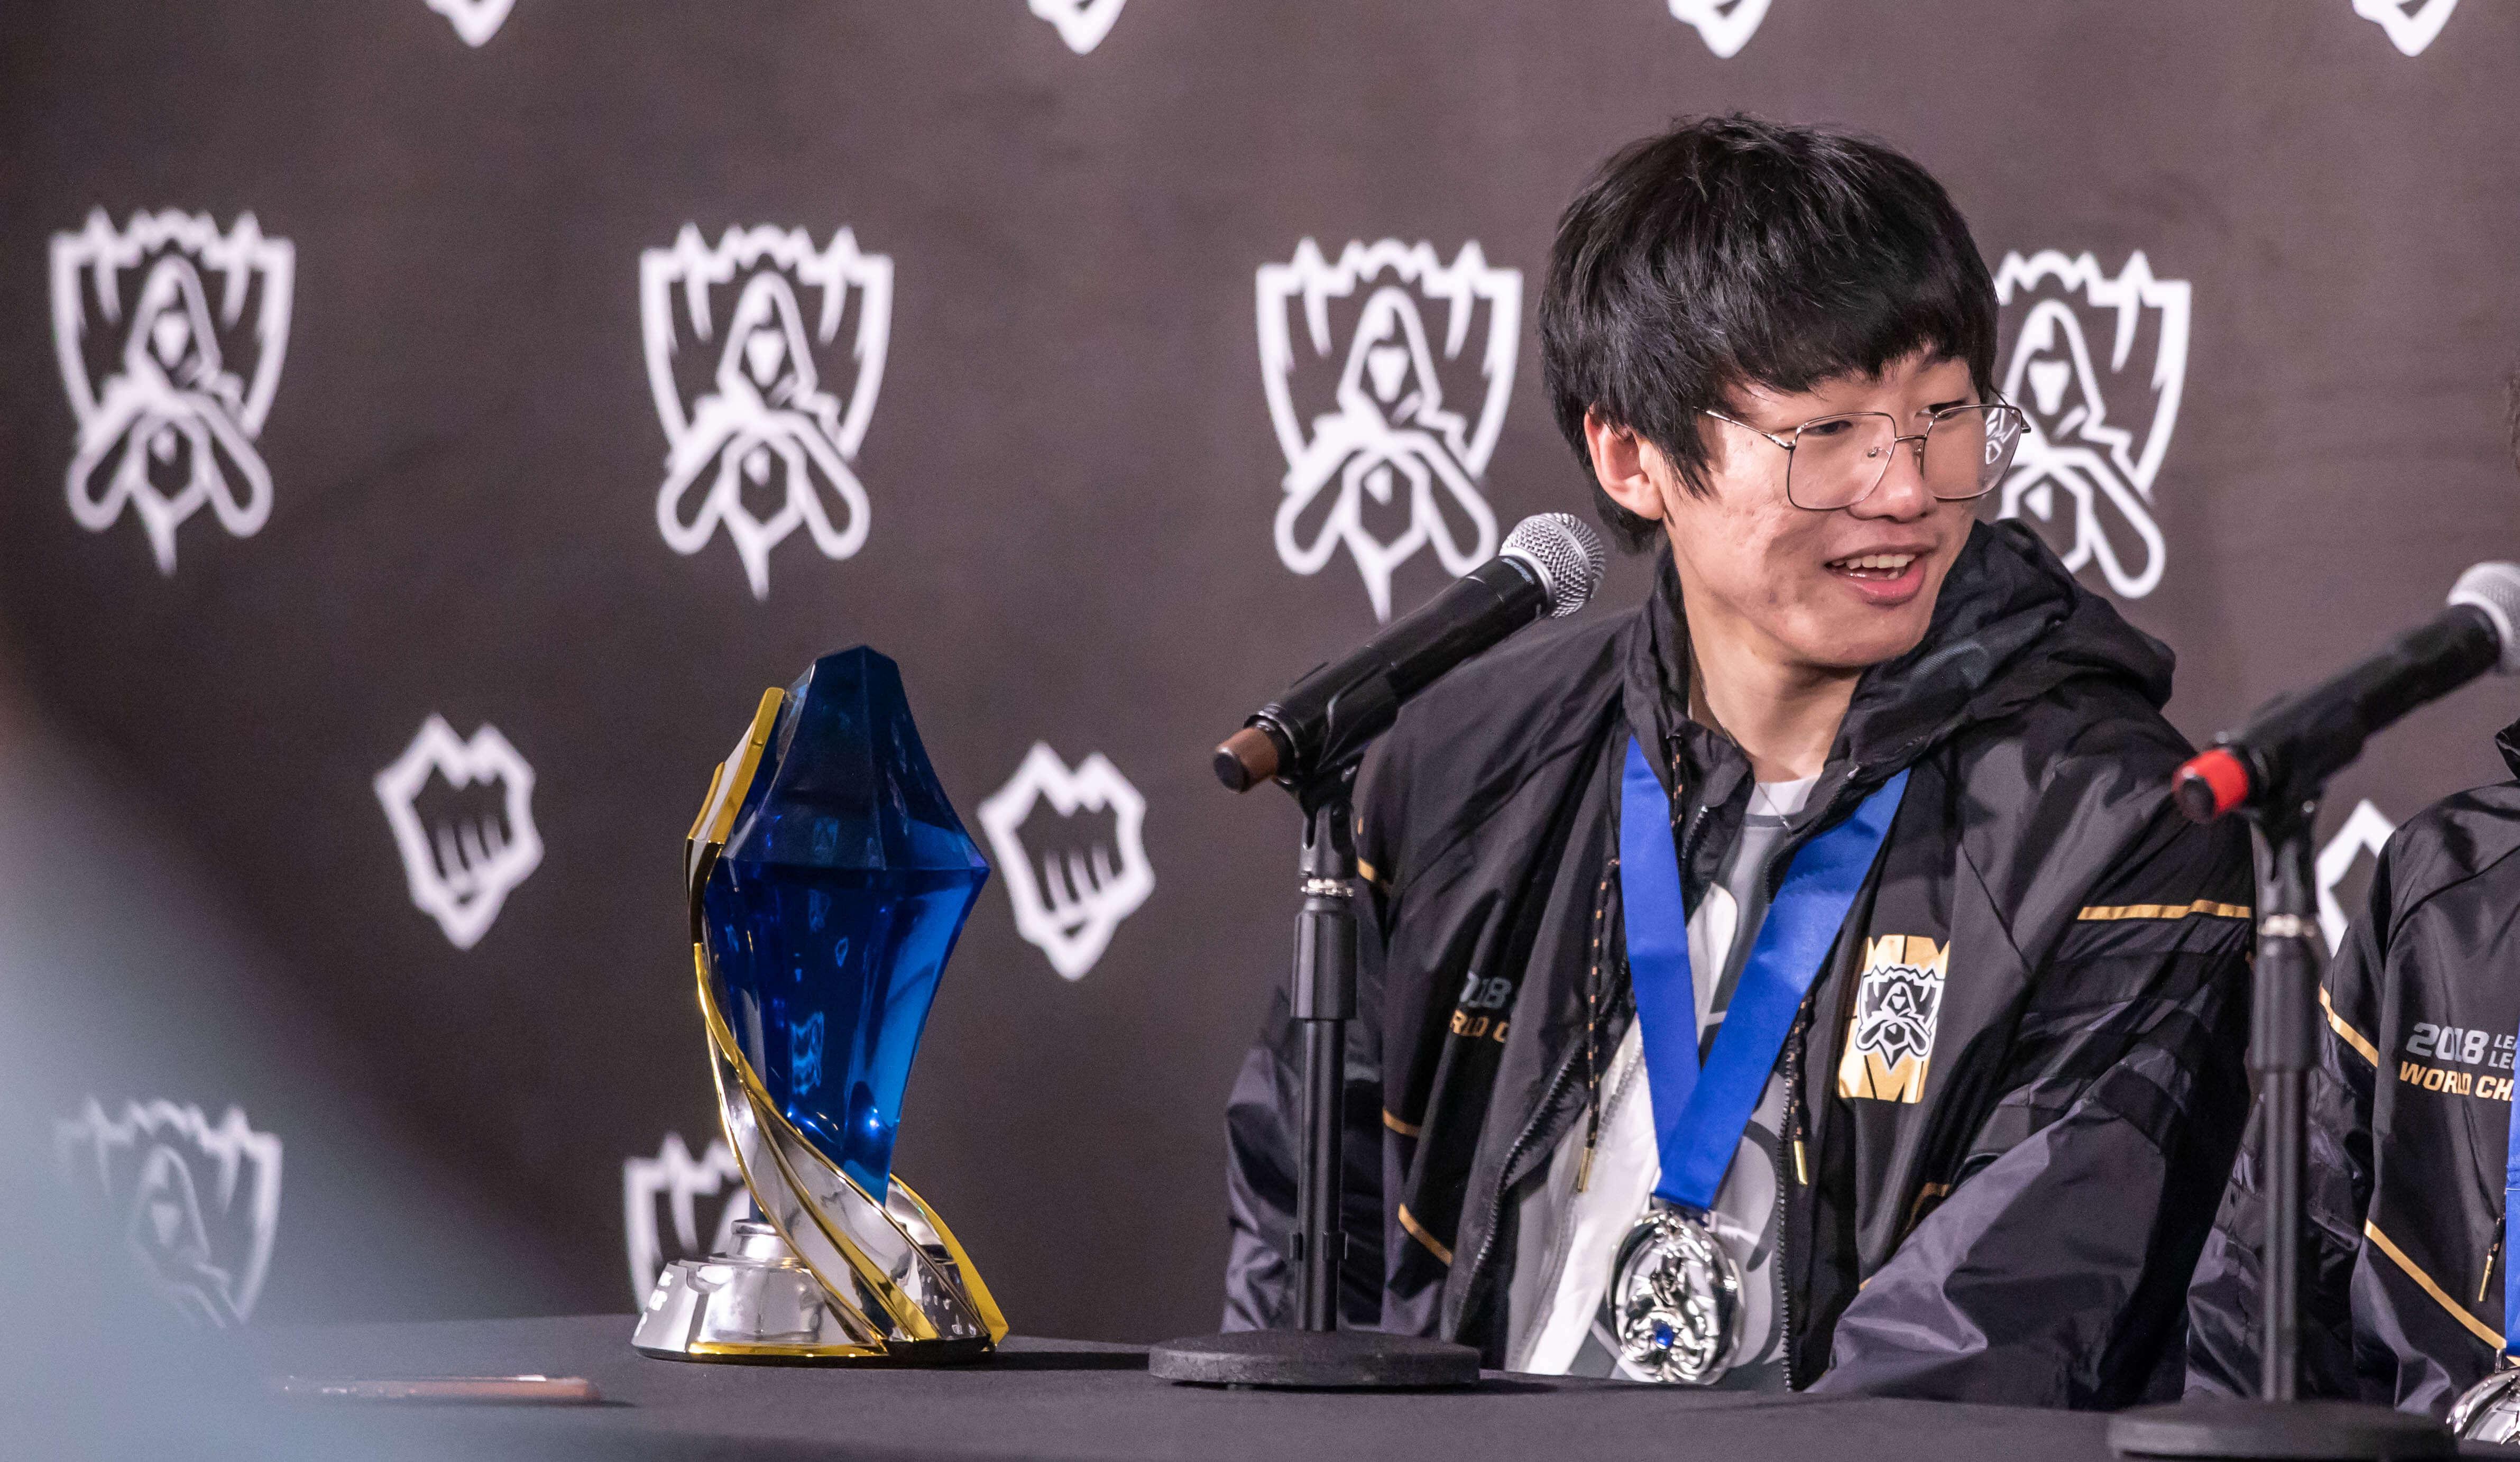 【PentaQ刺猬问答】如何看待 iG 打野位选手「ning」拿到 S8 总决赛 MVP?